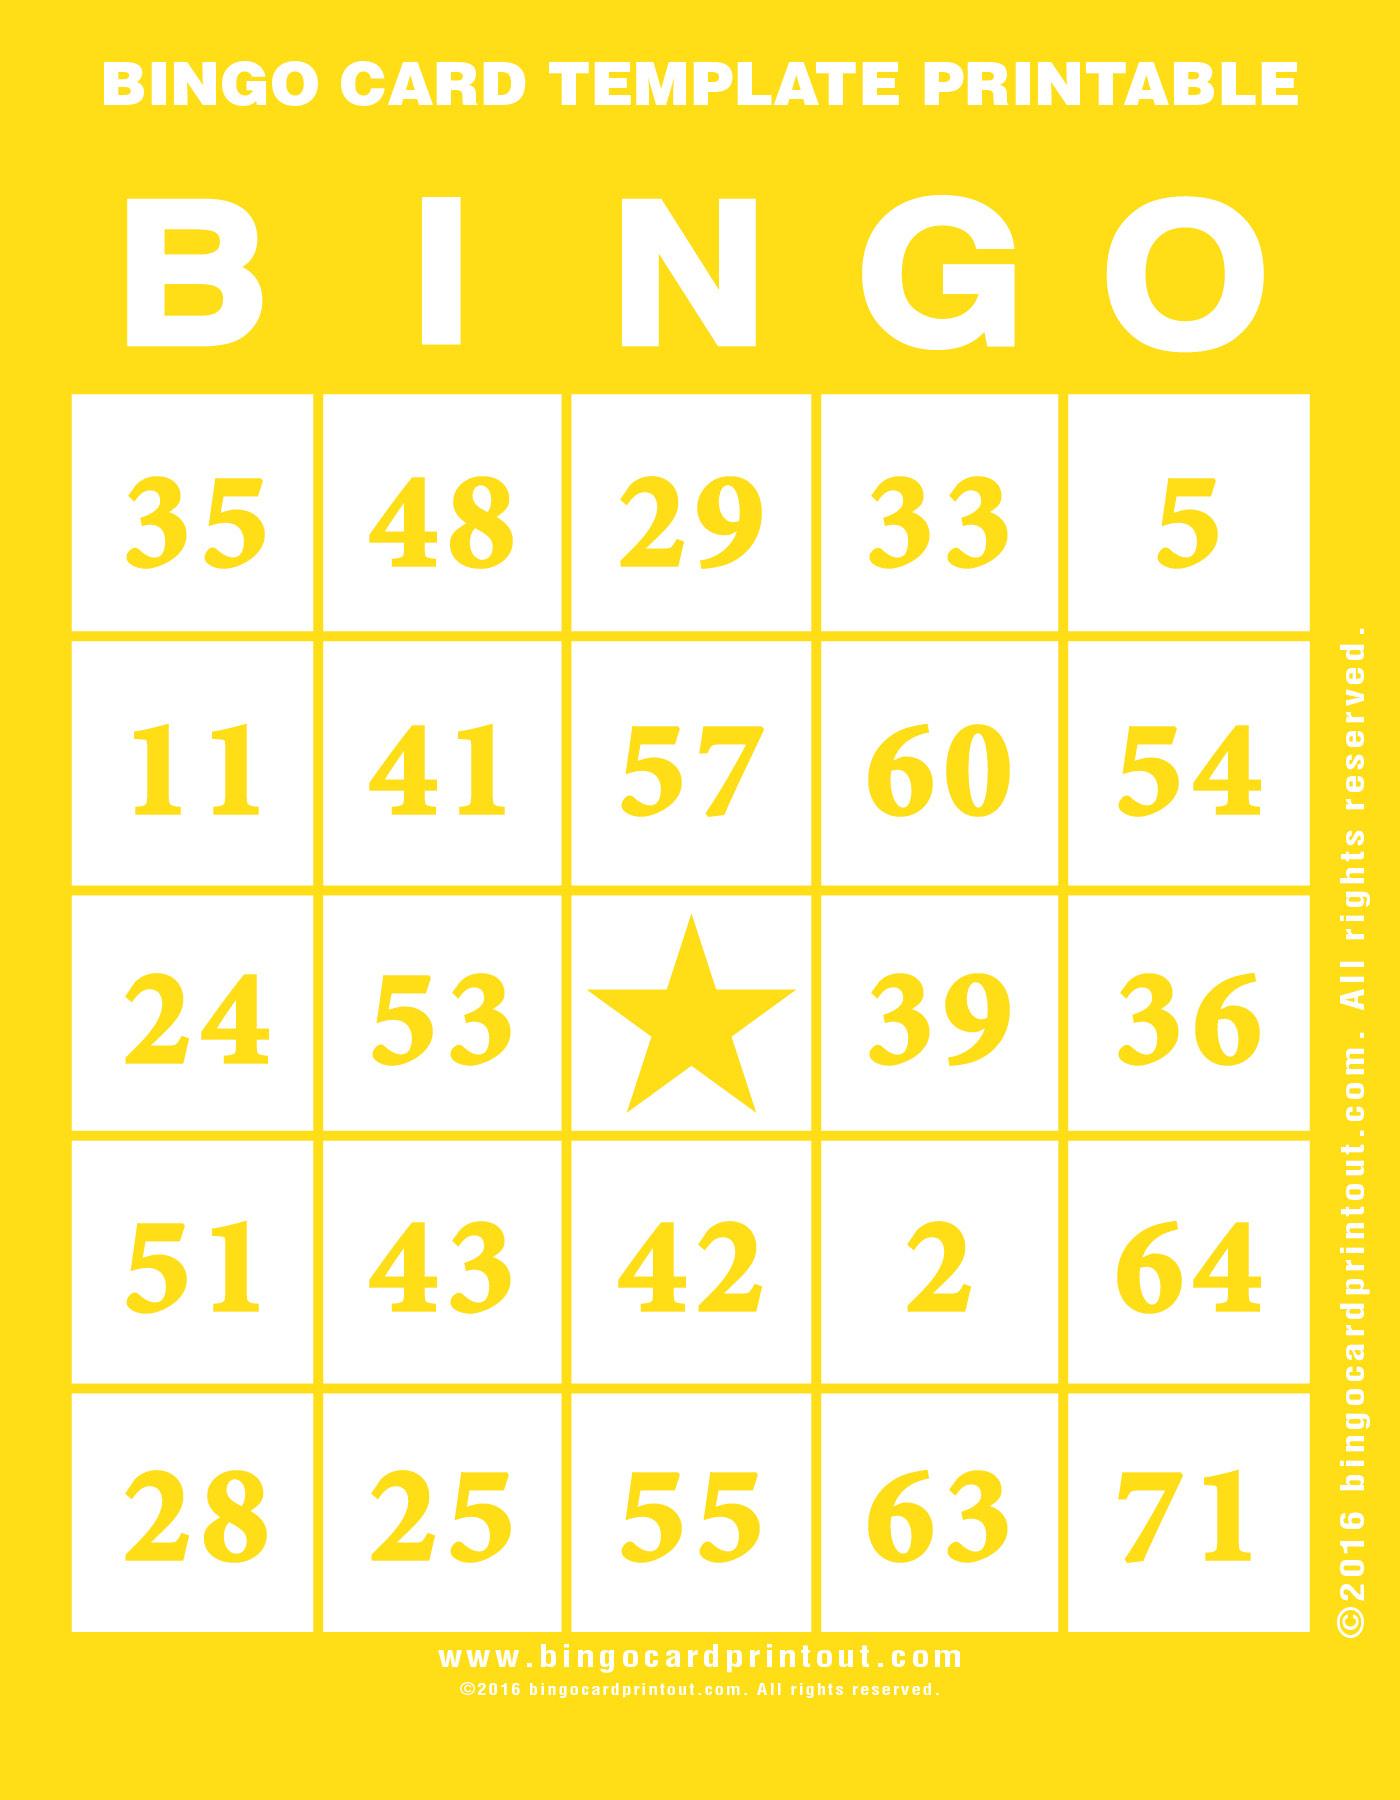 Bingo Card Template Printable - Bingocardprintout